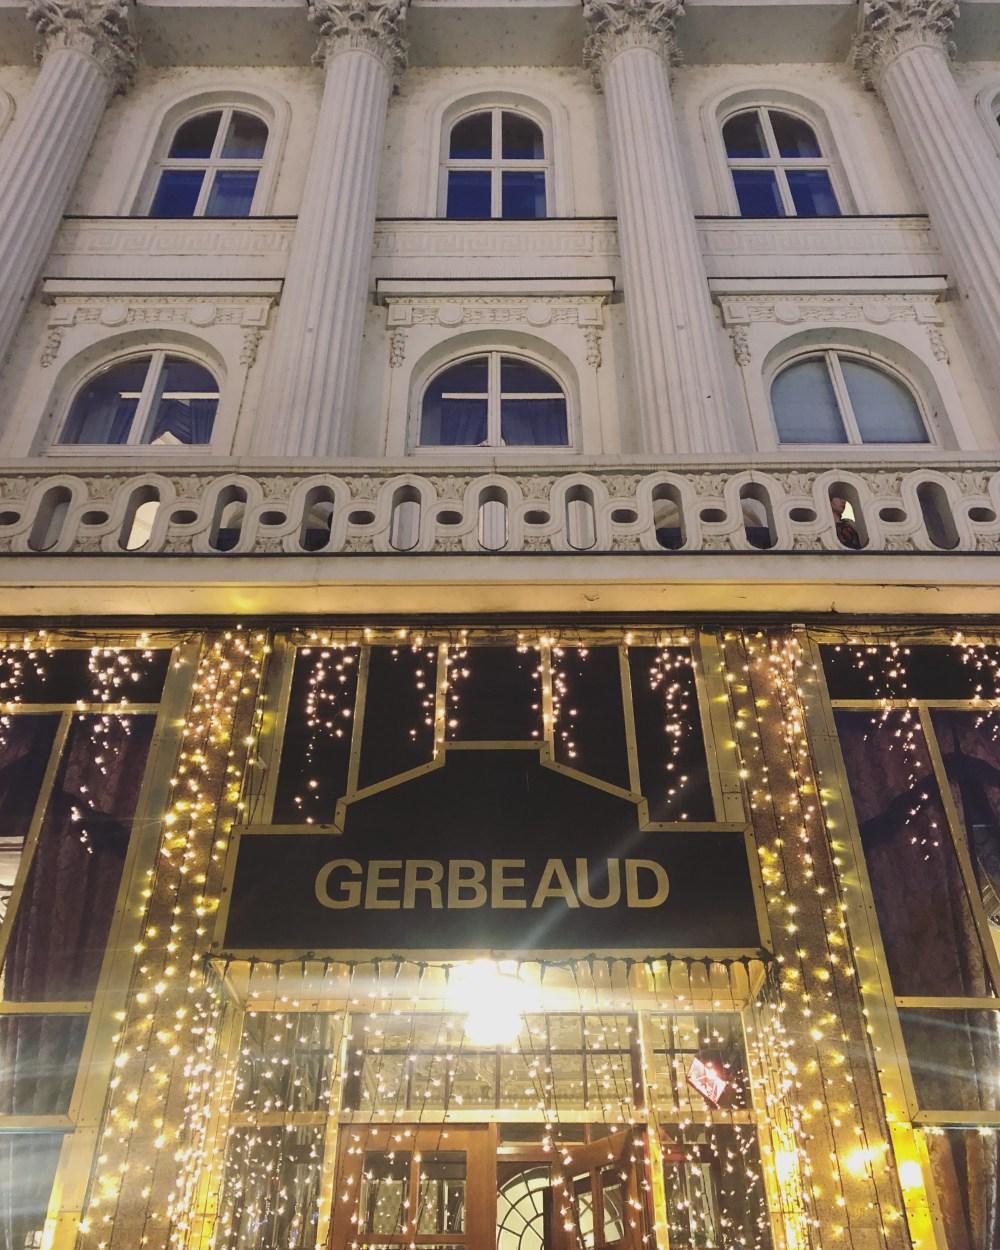 4 Café Gerbeaud